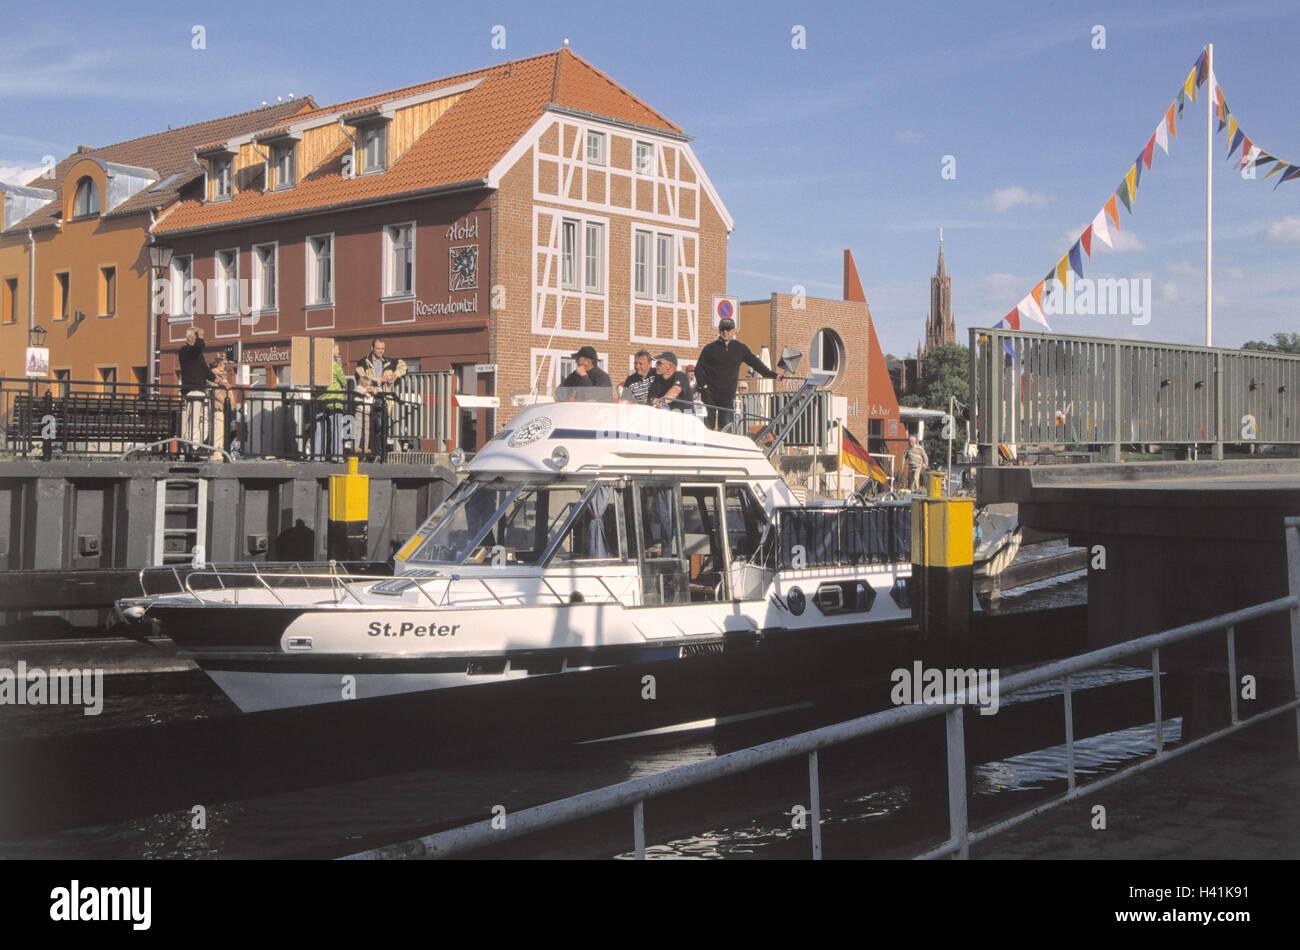 Germany, Mecklenburg-West Pomerania, Malchow, swing bridge, boat, spectator, Europe, North Germany, Mecklenburg - Stock Image